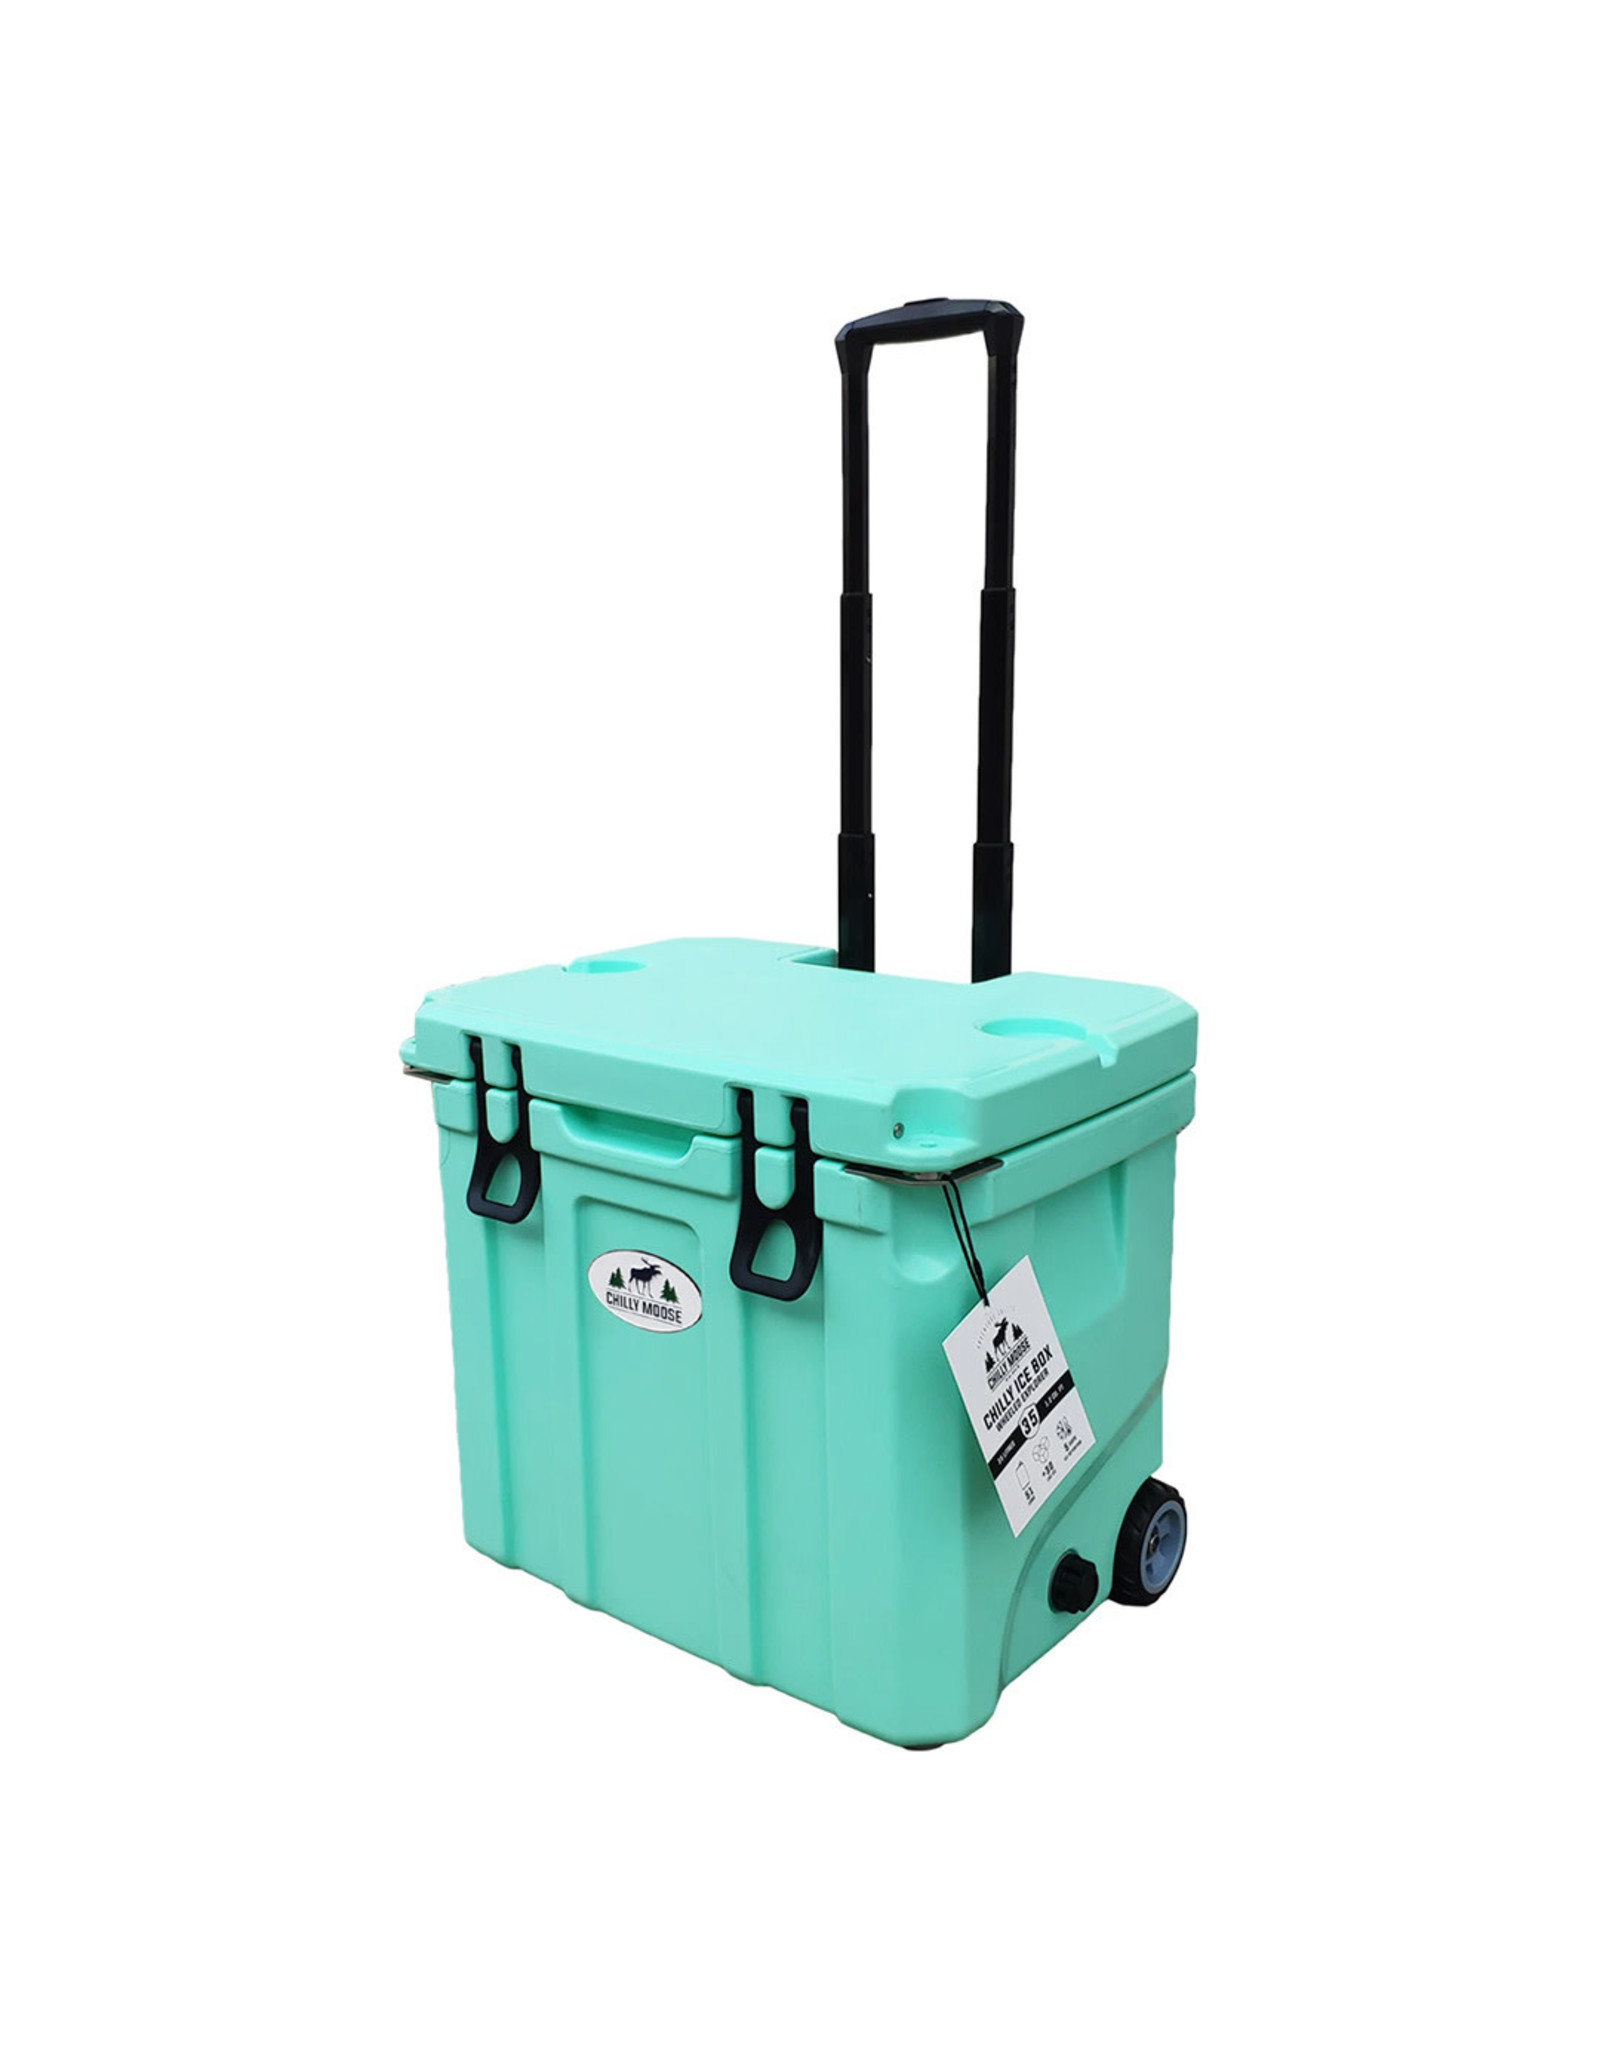 35 Ltr Cooler w/ Wheels